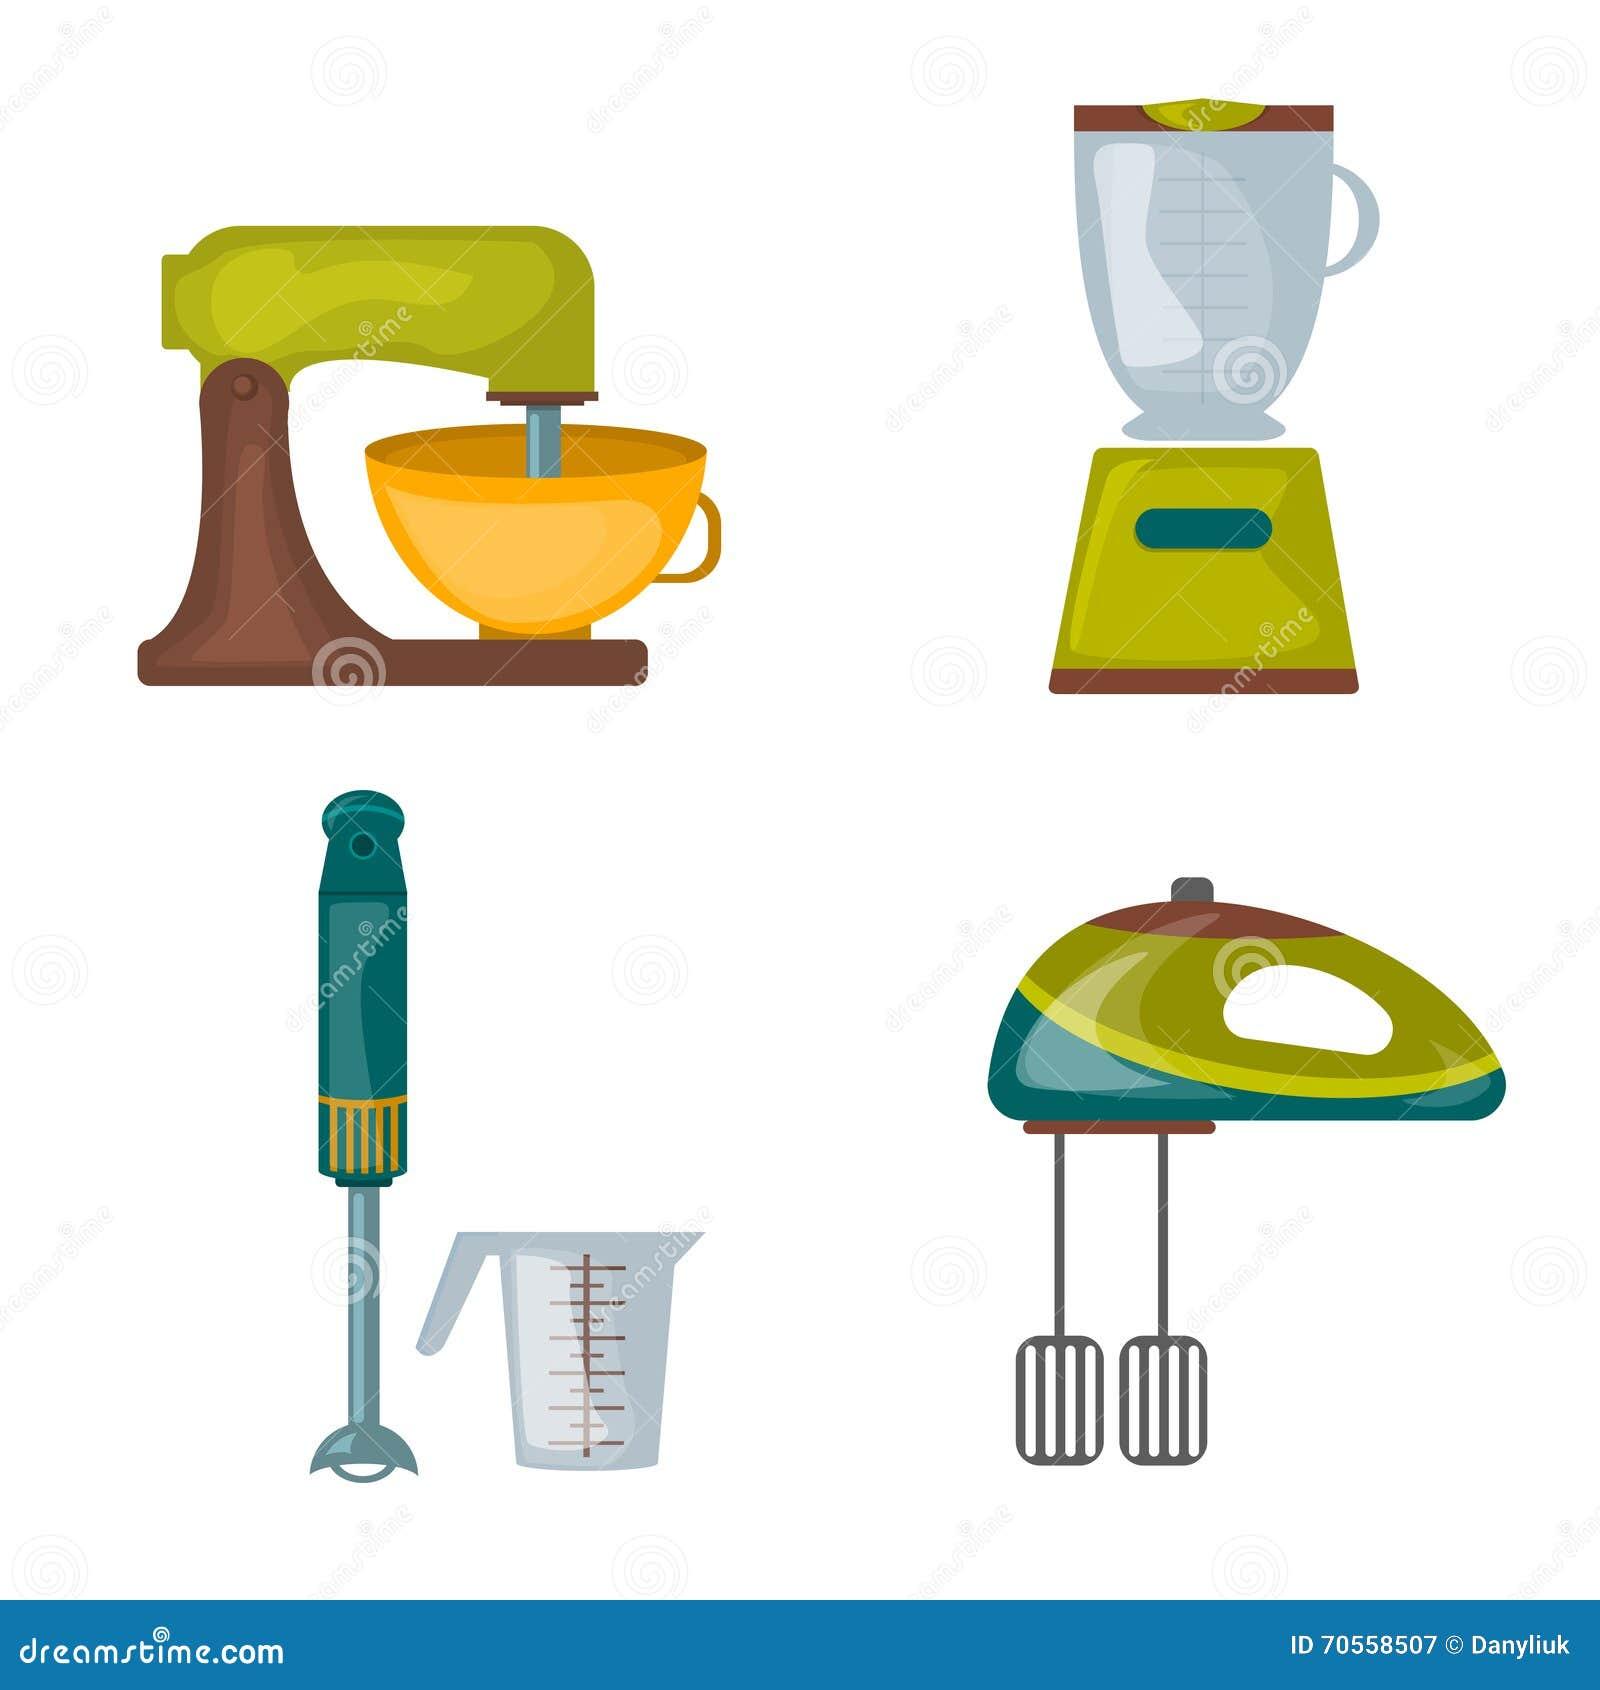 Cartoon Food Processor ~ Cooking hand with blender vector illustration